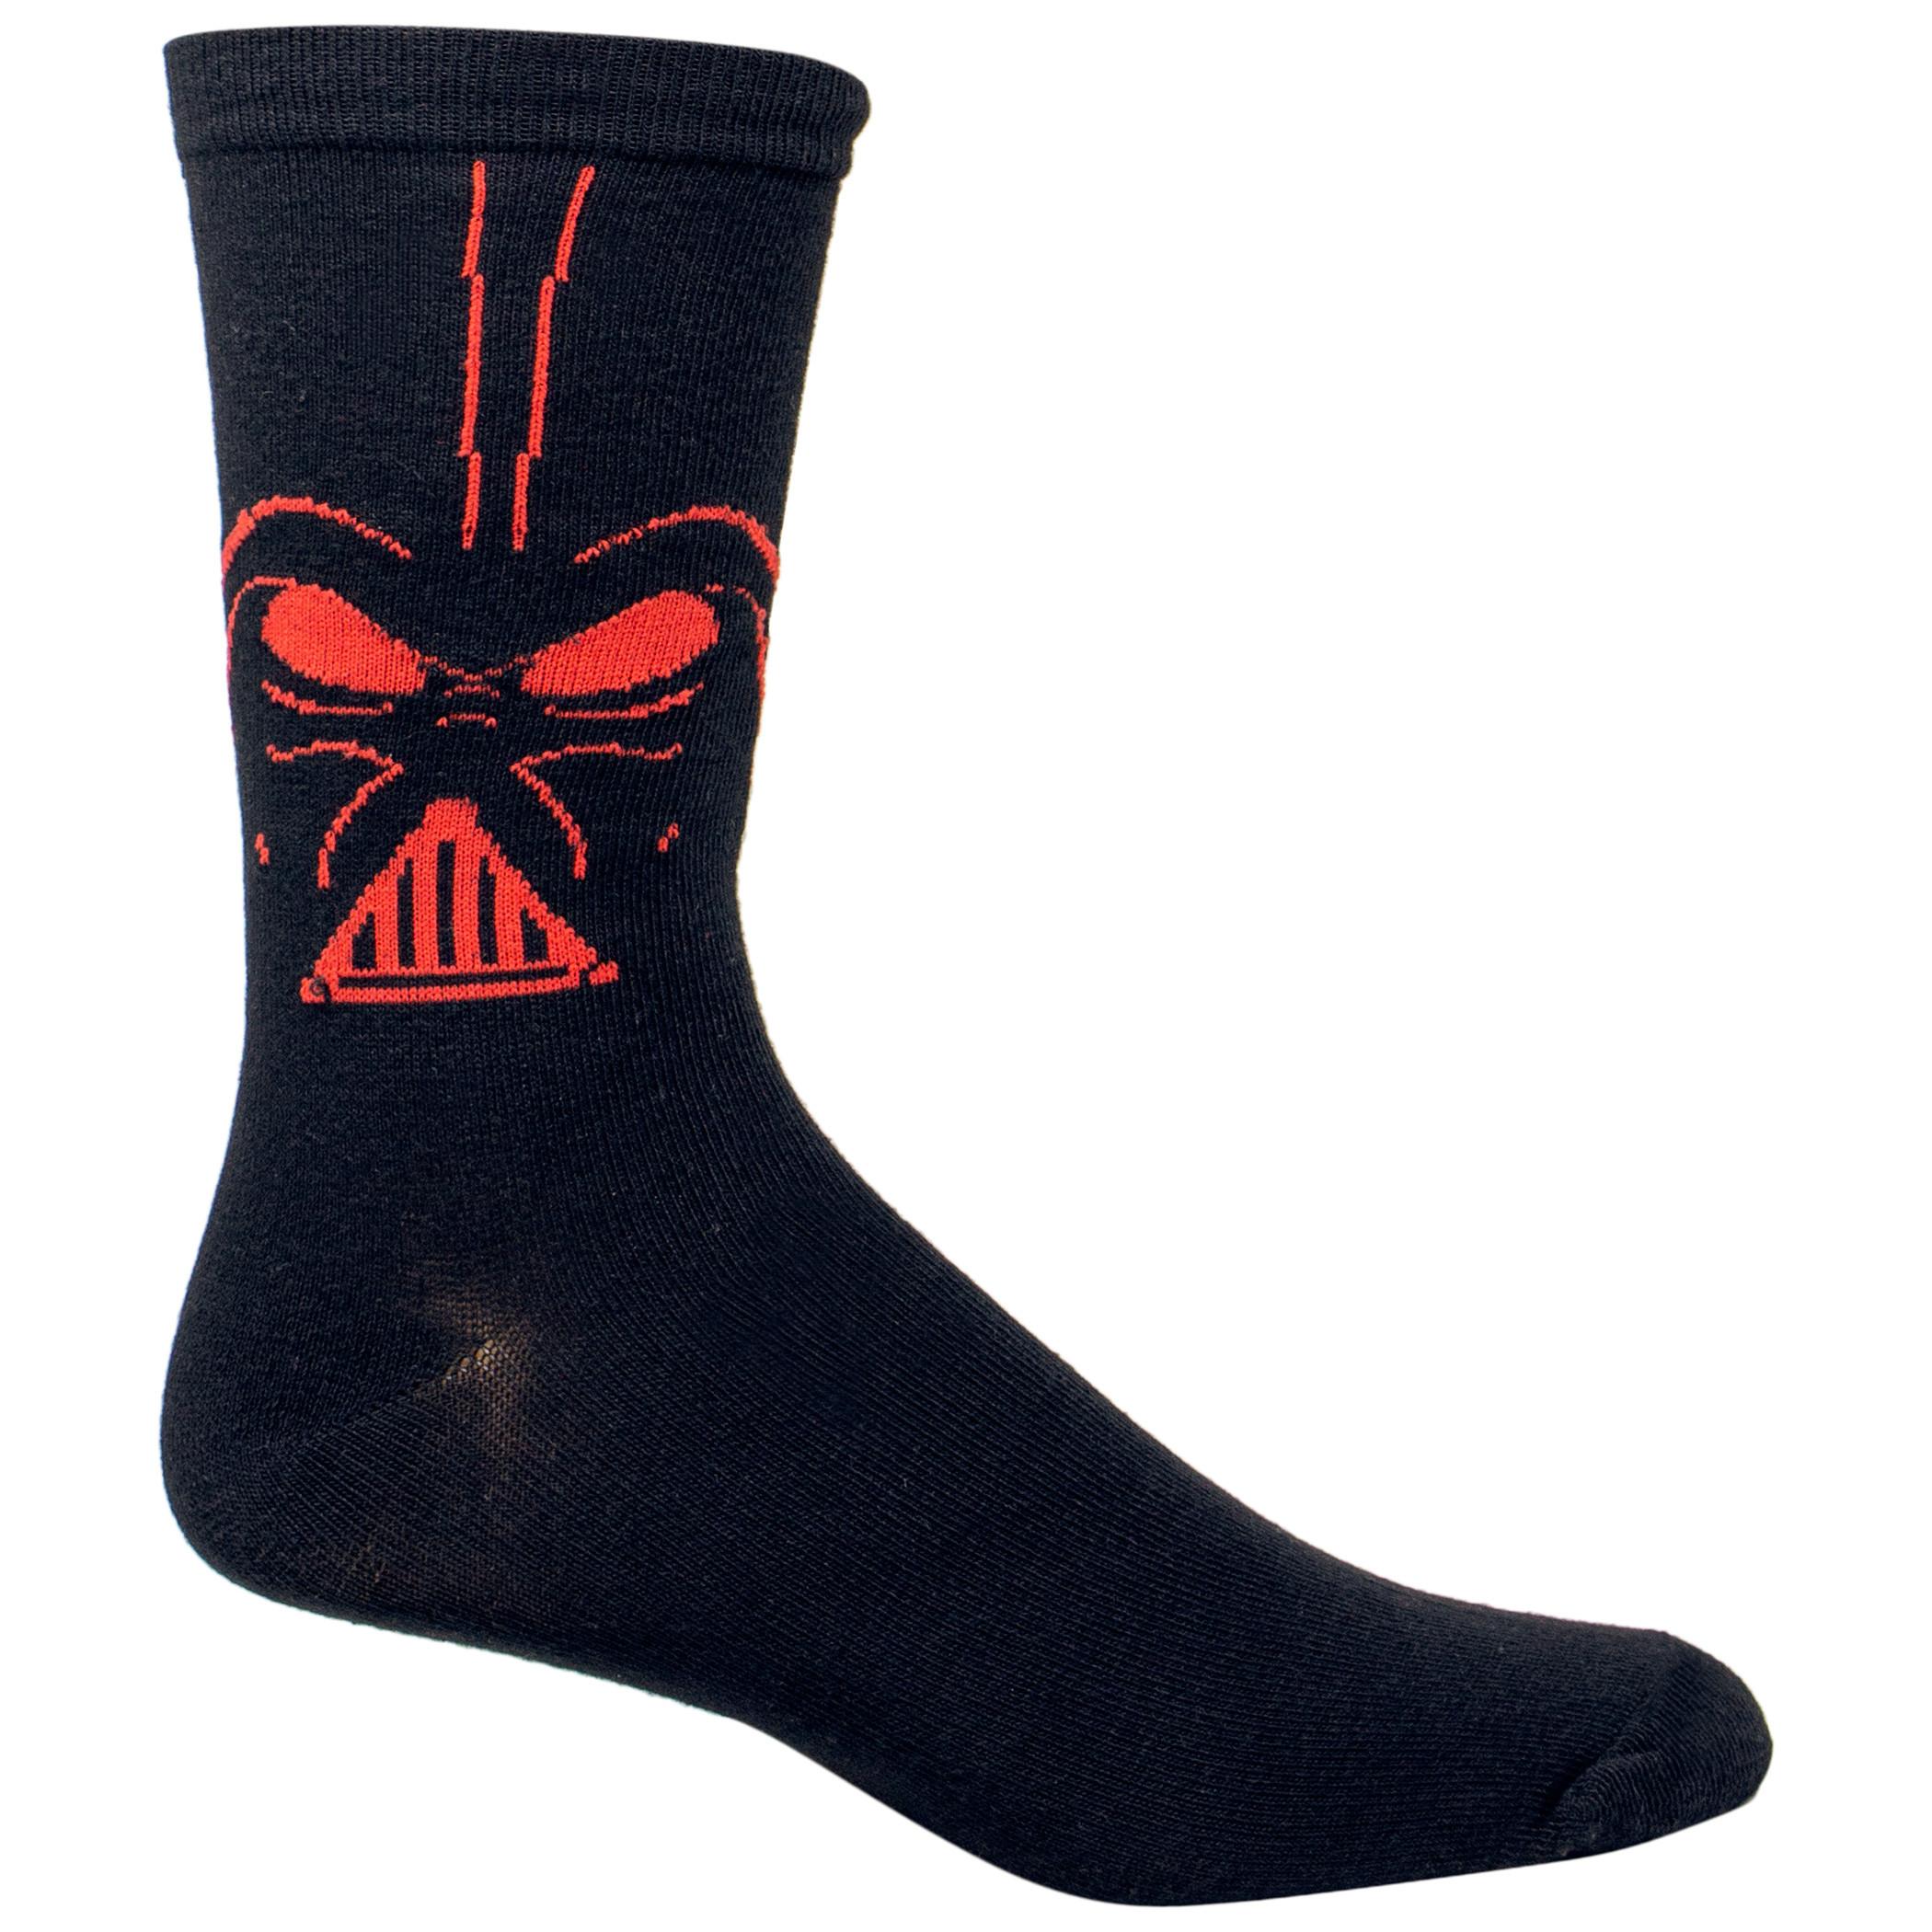 Star Wars Darth Vader Costume Character Crew Socks